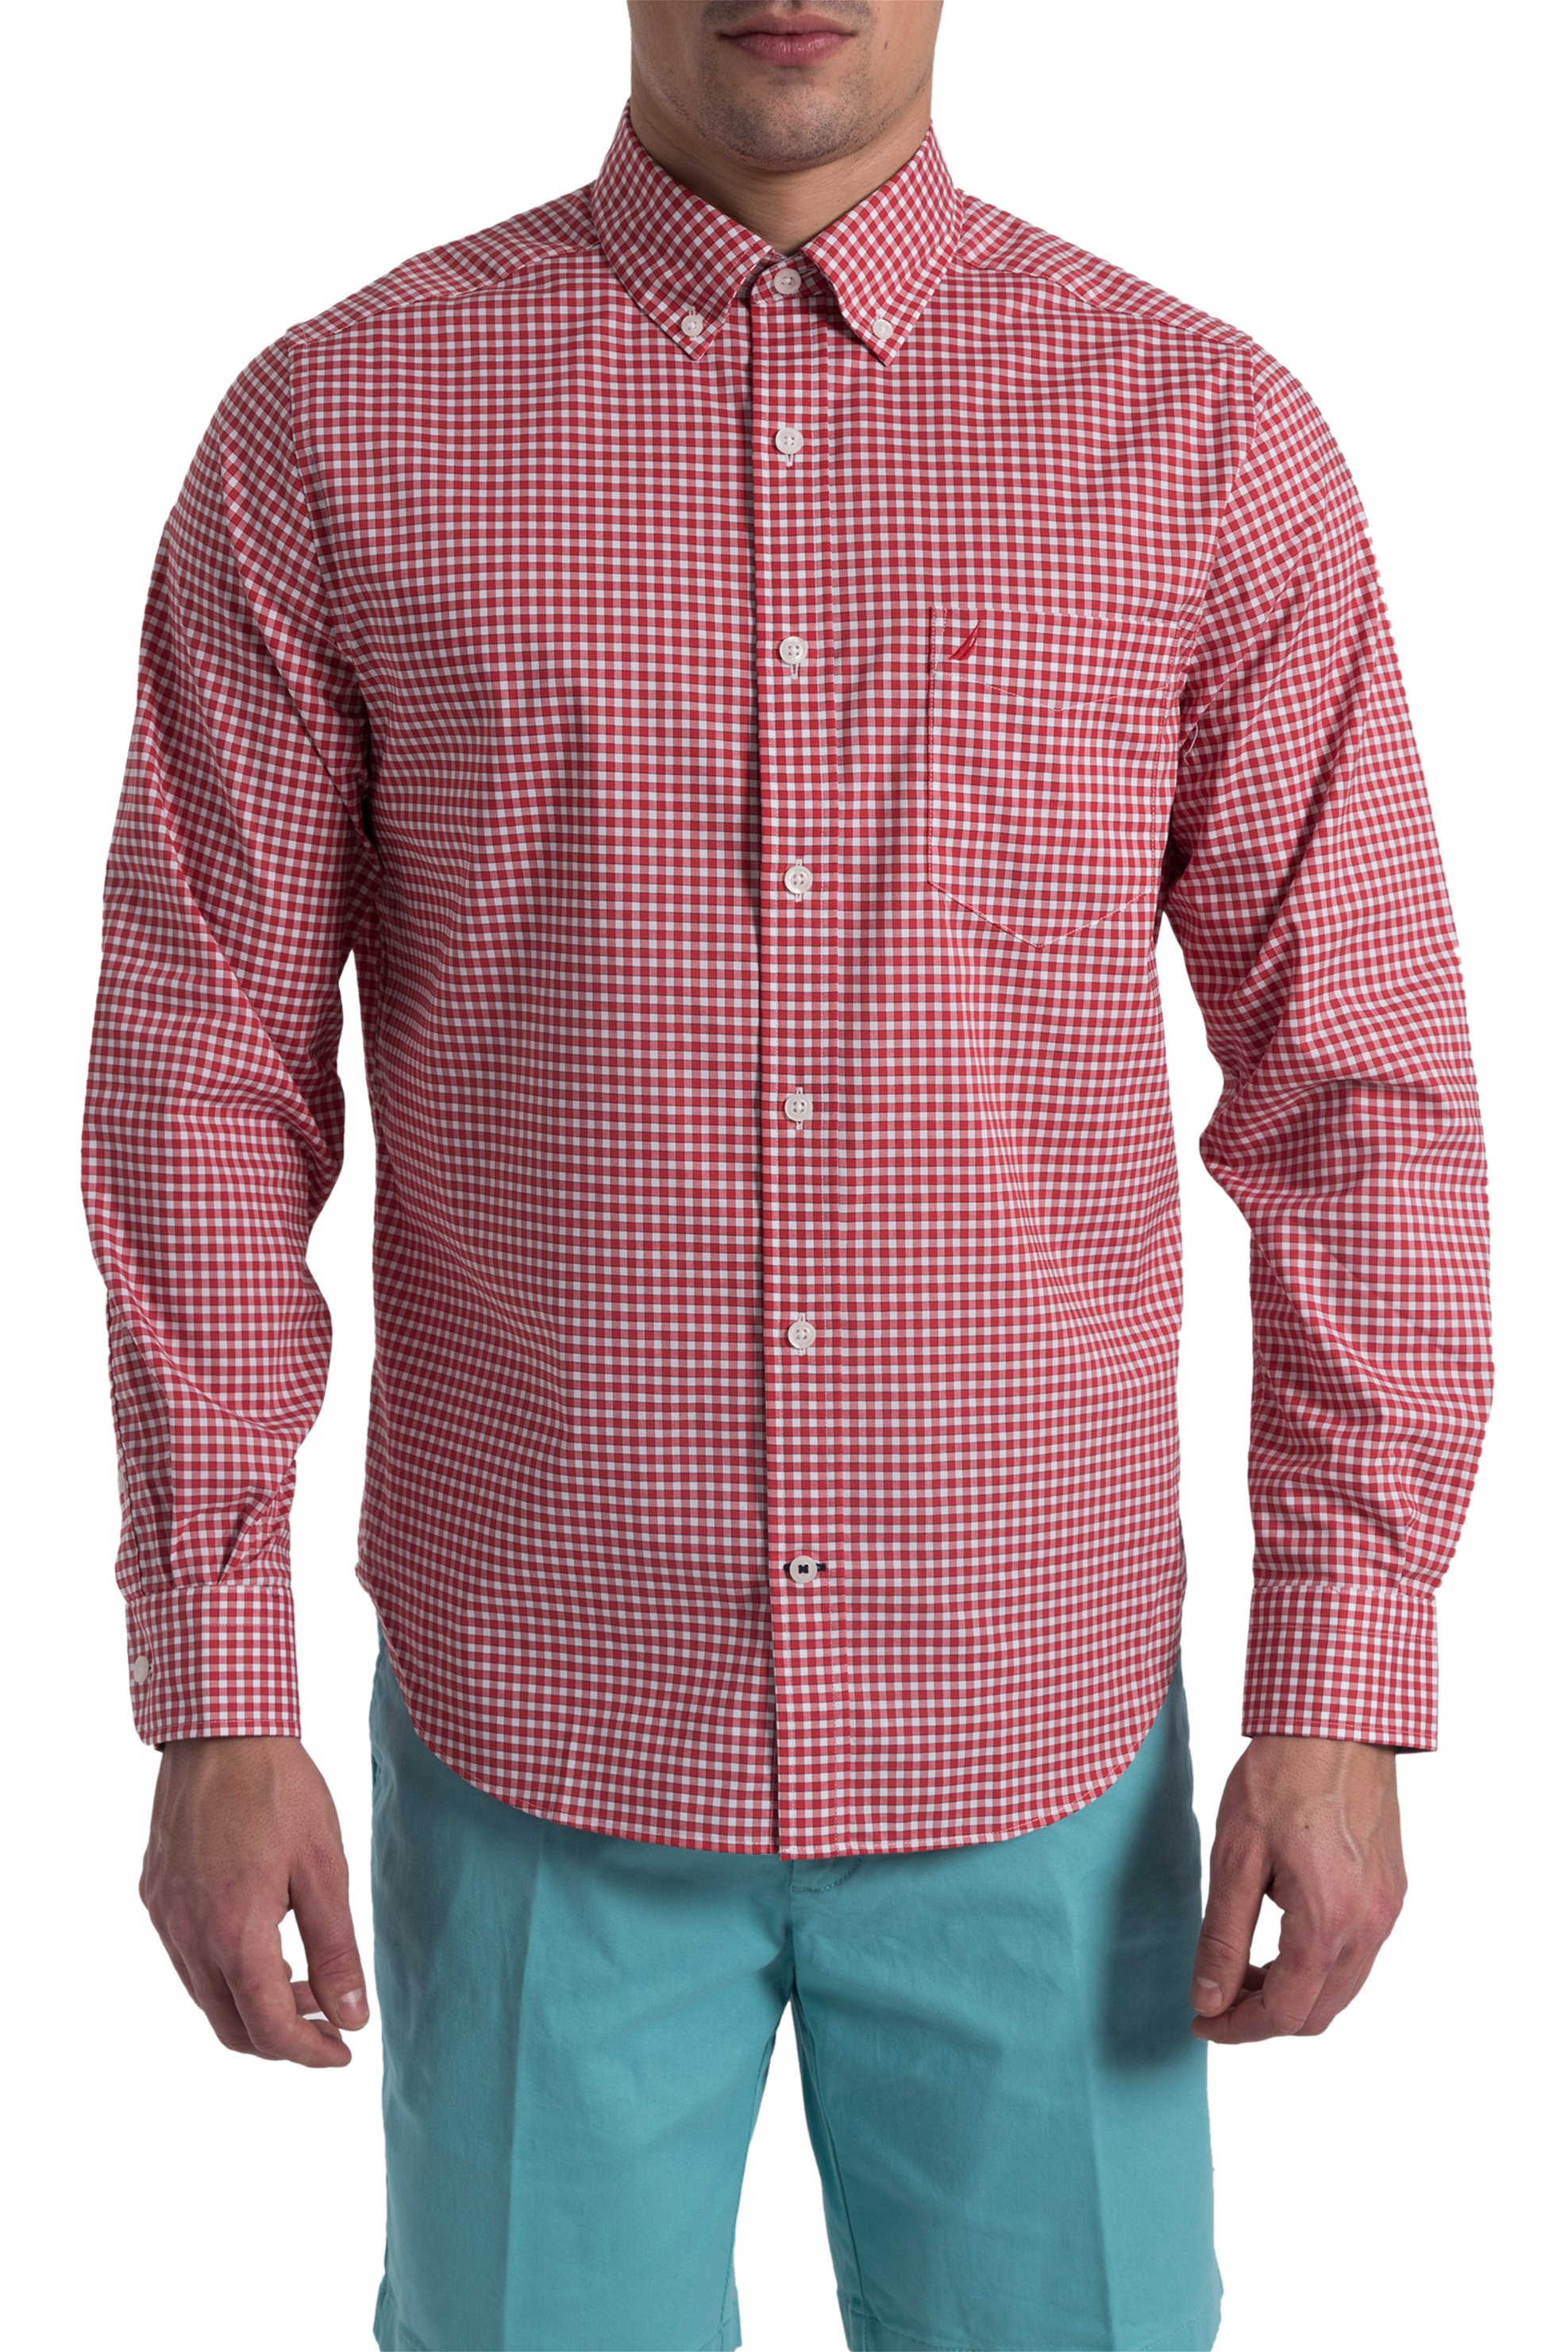 bd38b6c94016 Notos Ανδρικό καρό πουκάμισο Nautica - W81126 - Κόκκινο